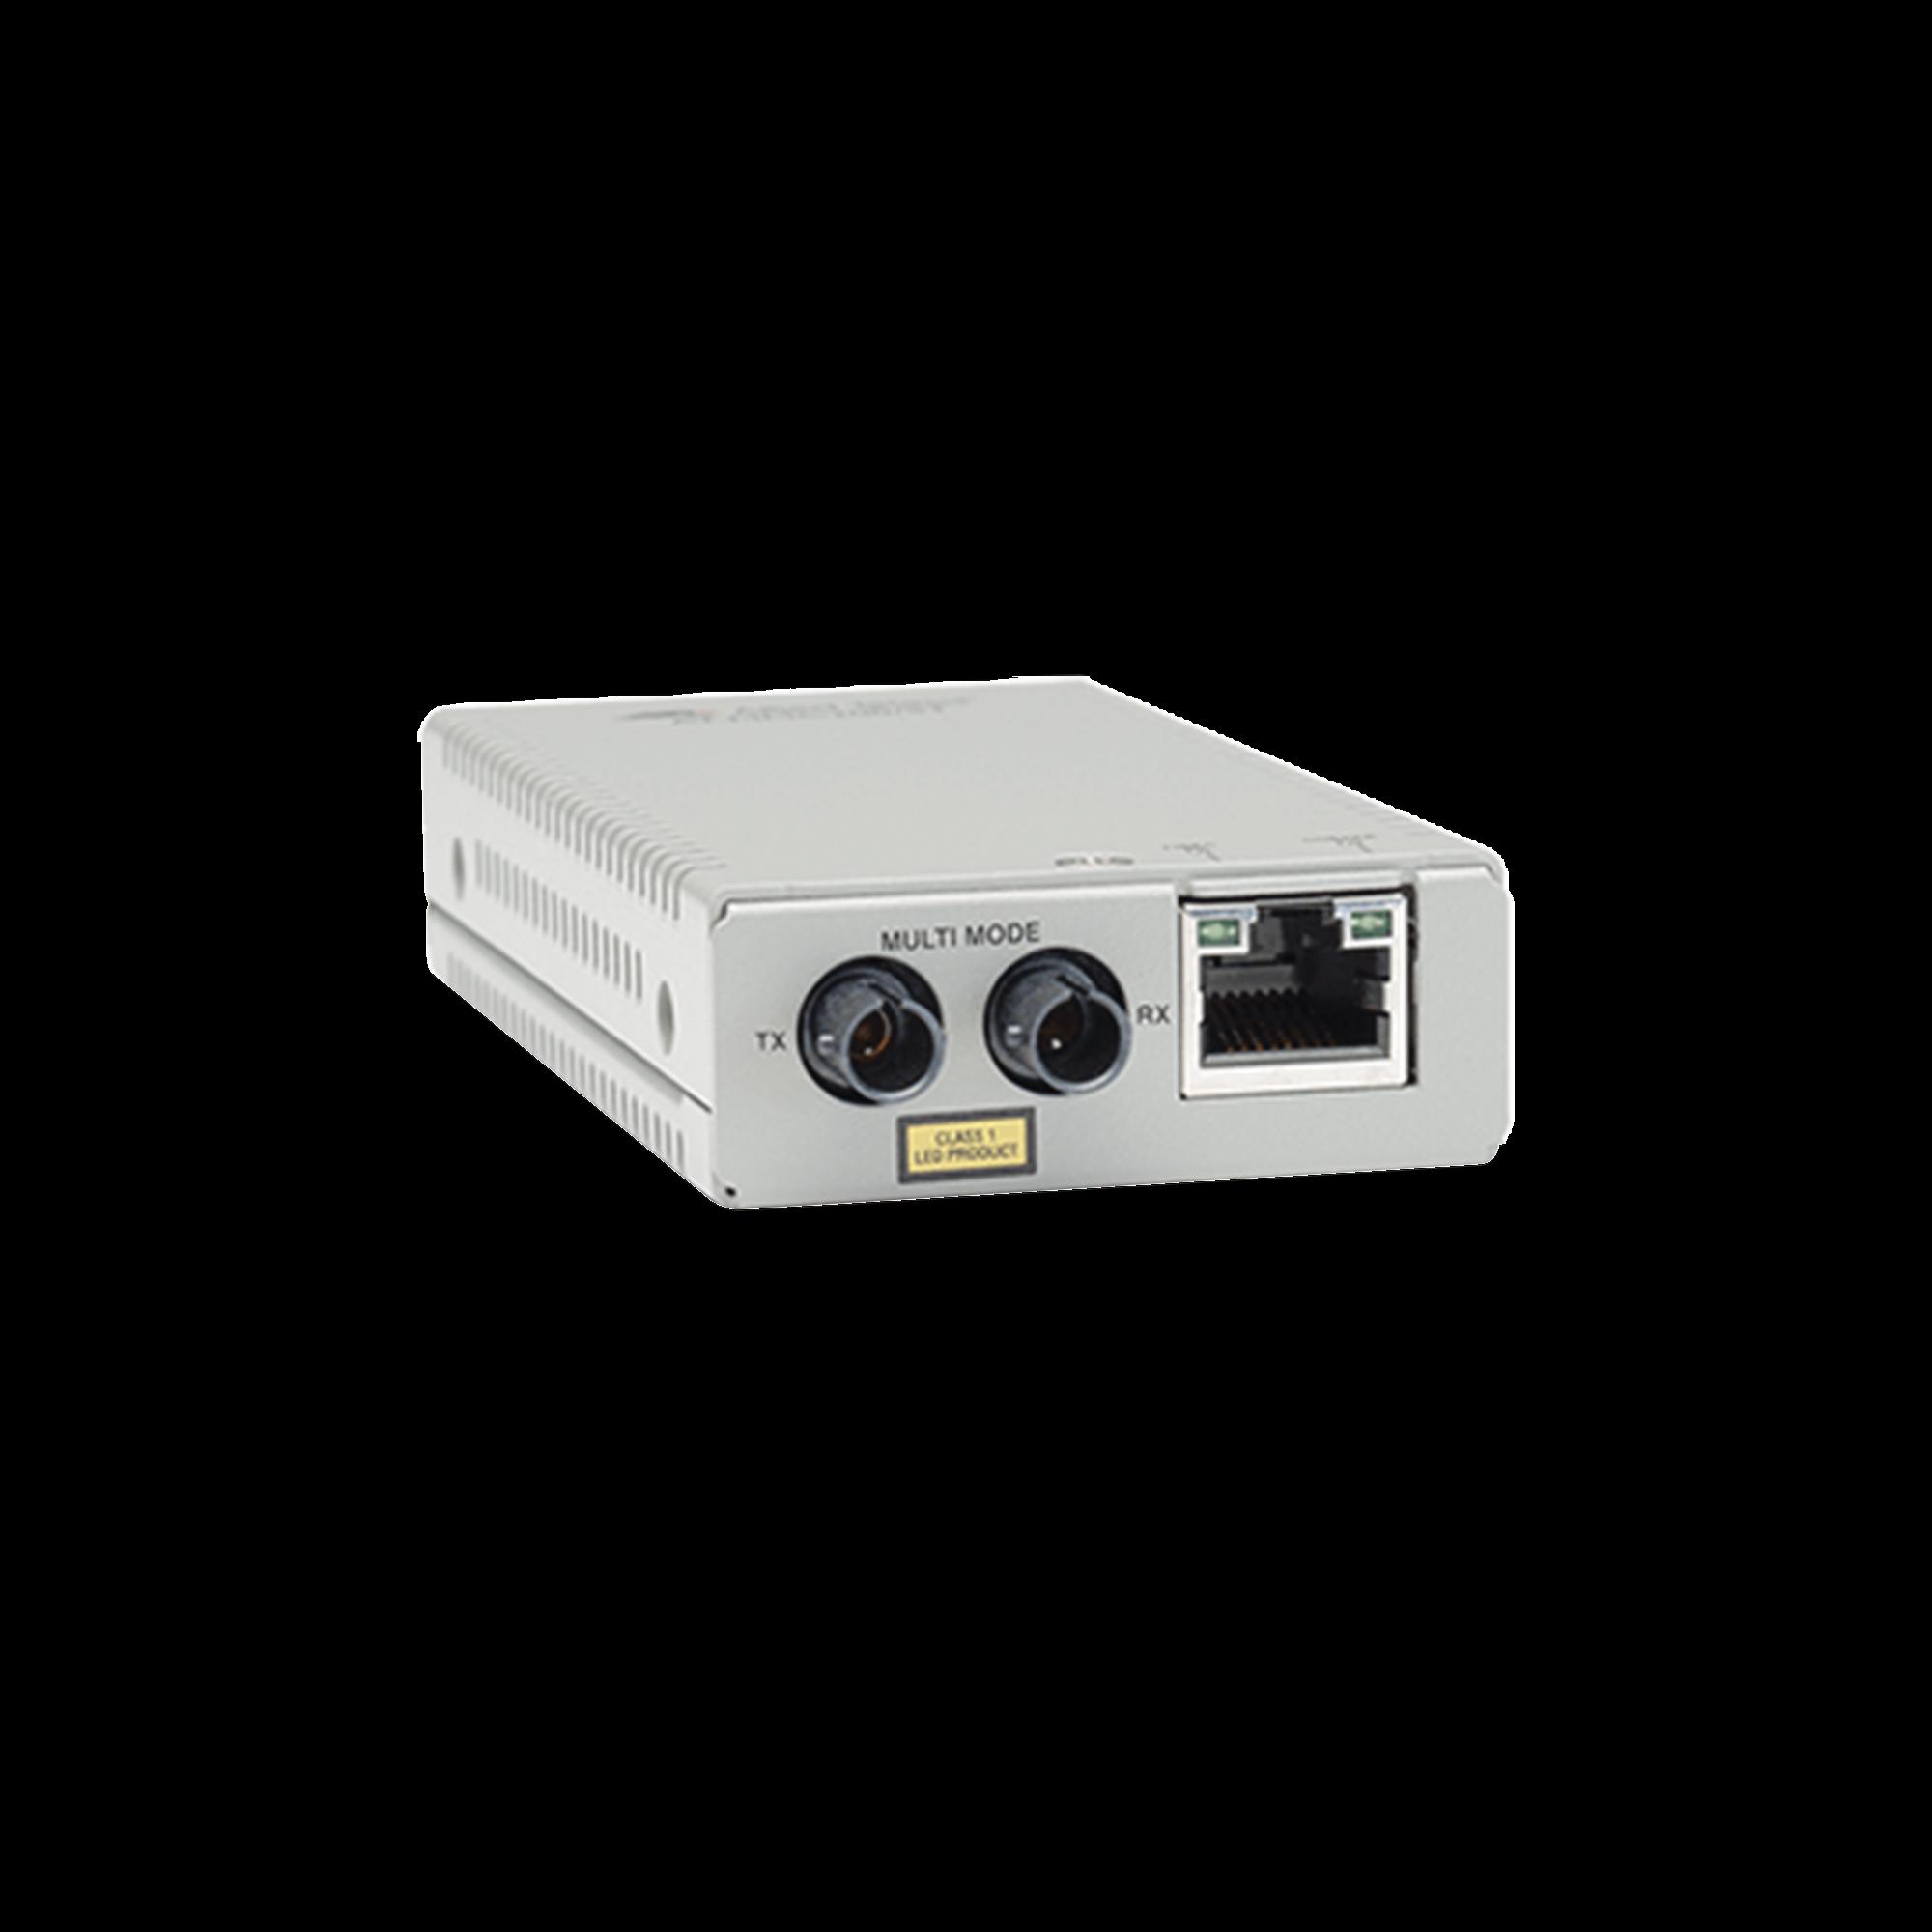 Convertidor de medios fast ethernet a fibra óptica, conector ST, multimodo (MMF), distancia hasta 2 km